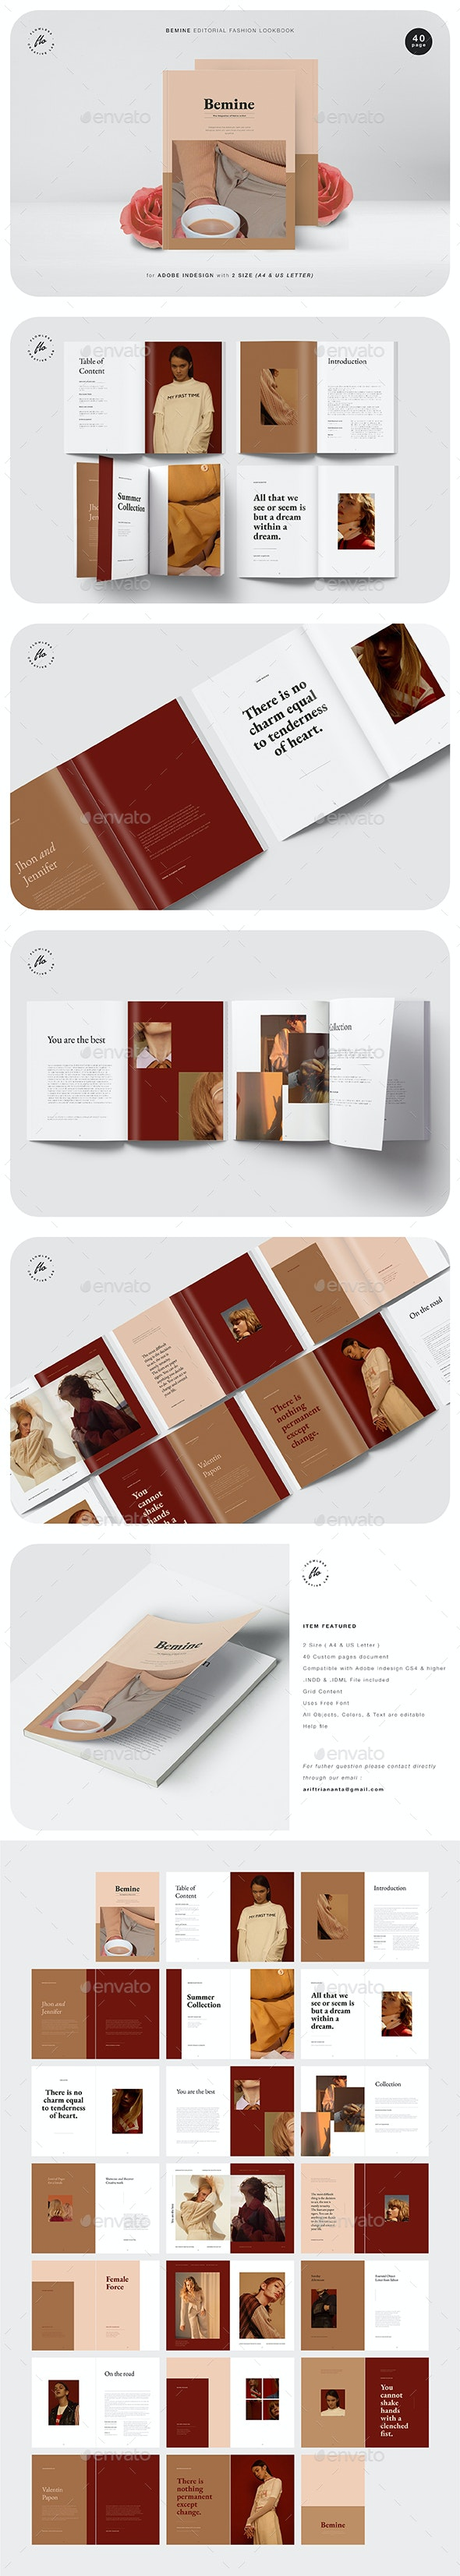 Bemine Editorial Fashion Lookbook - Magazines Print Templates